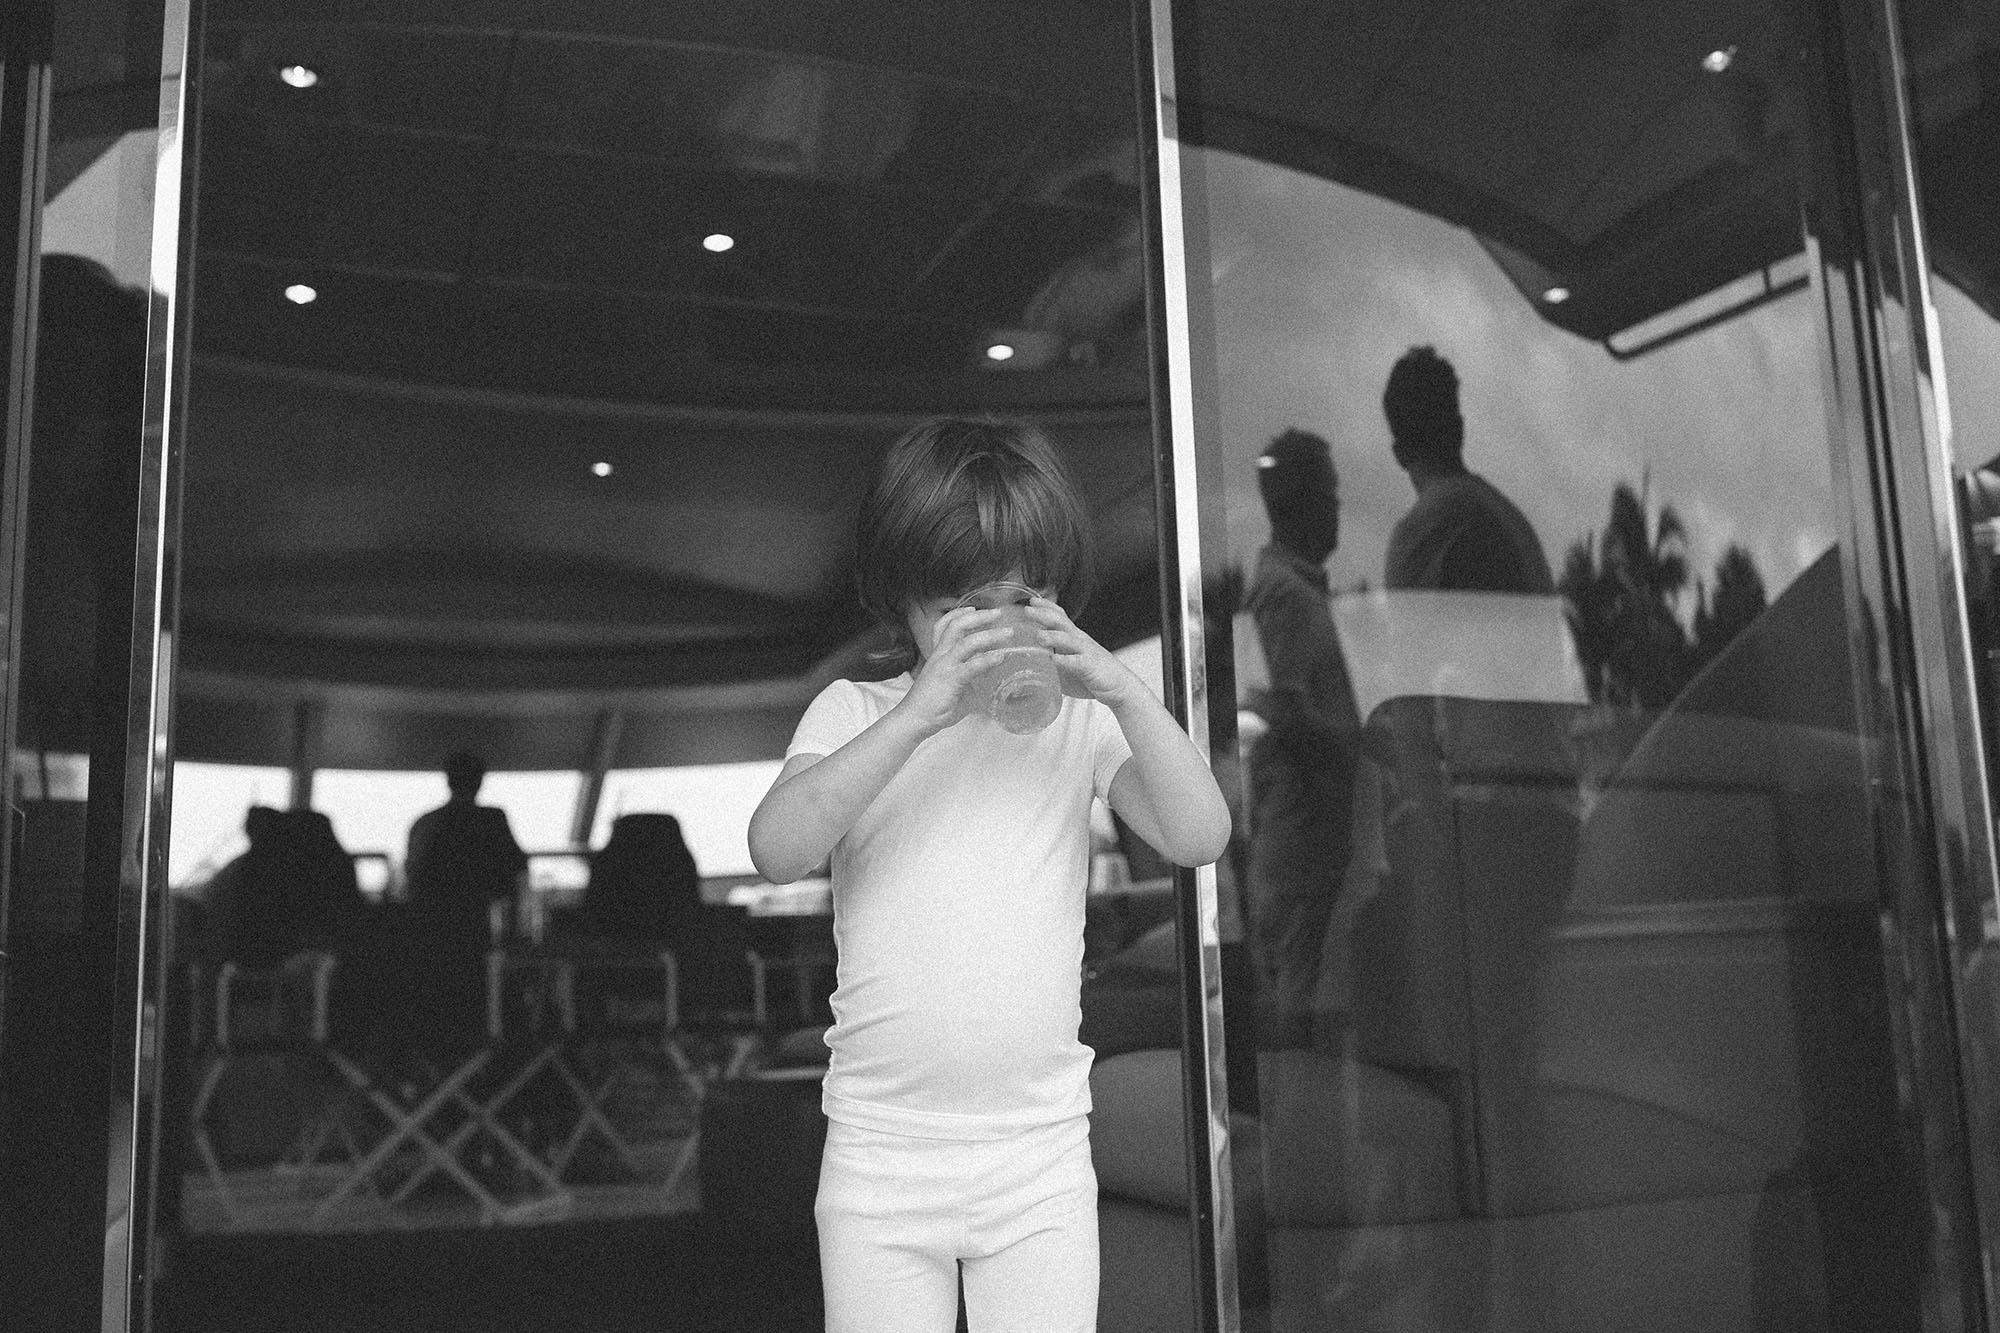 nhl_all_star_break_miami_toddlers_bw17.jpg